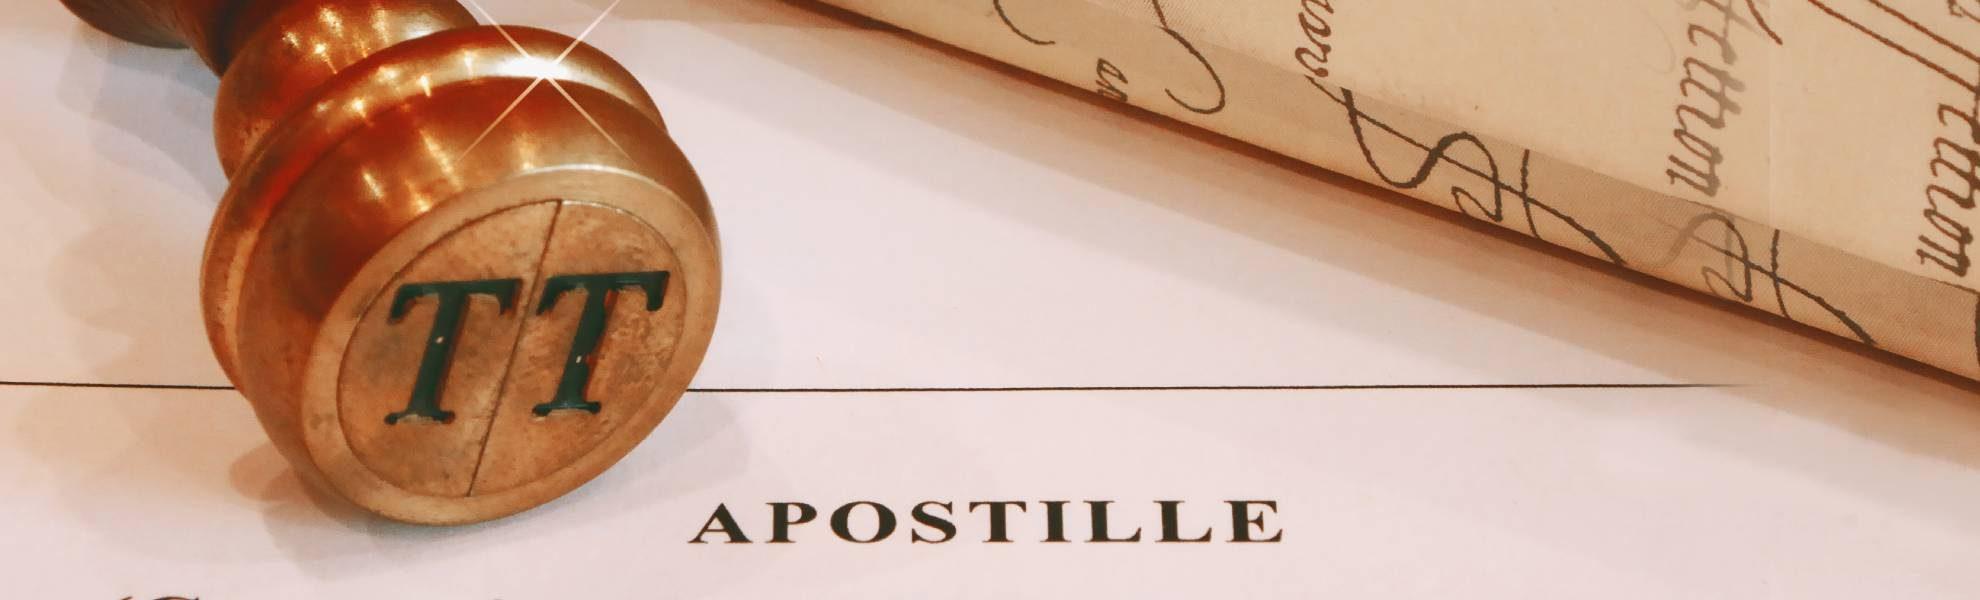 traduzioni-giurate-apostille